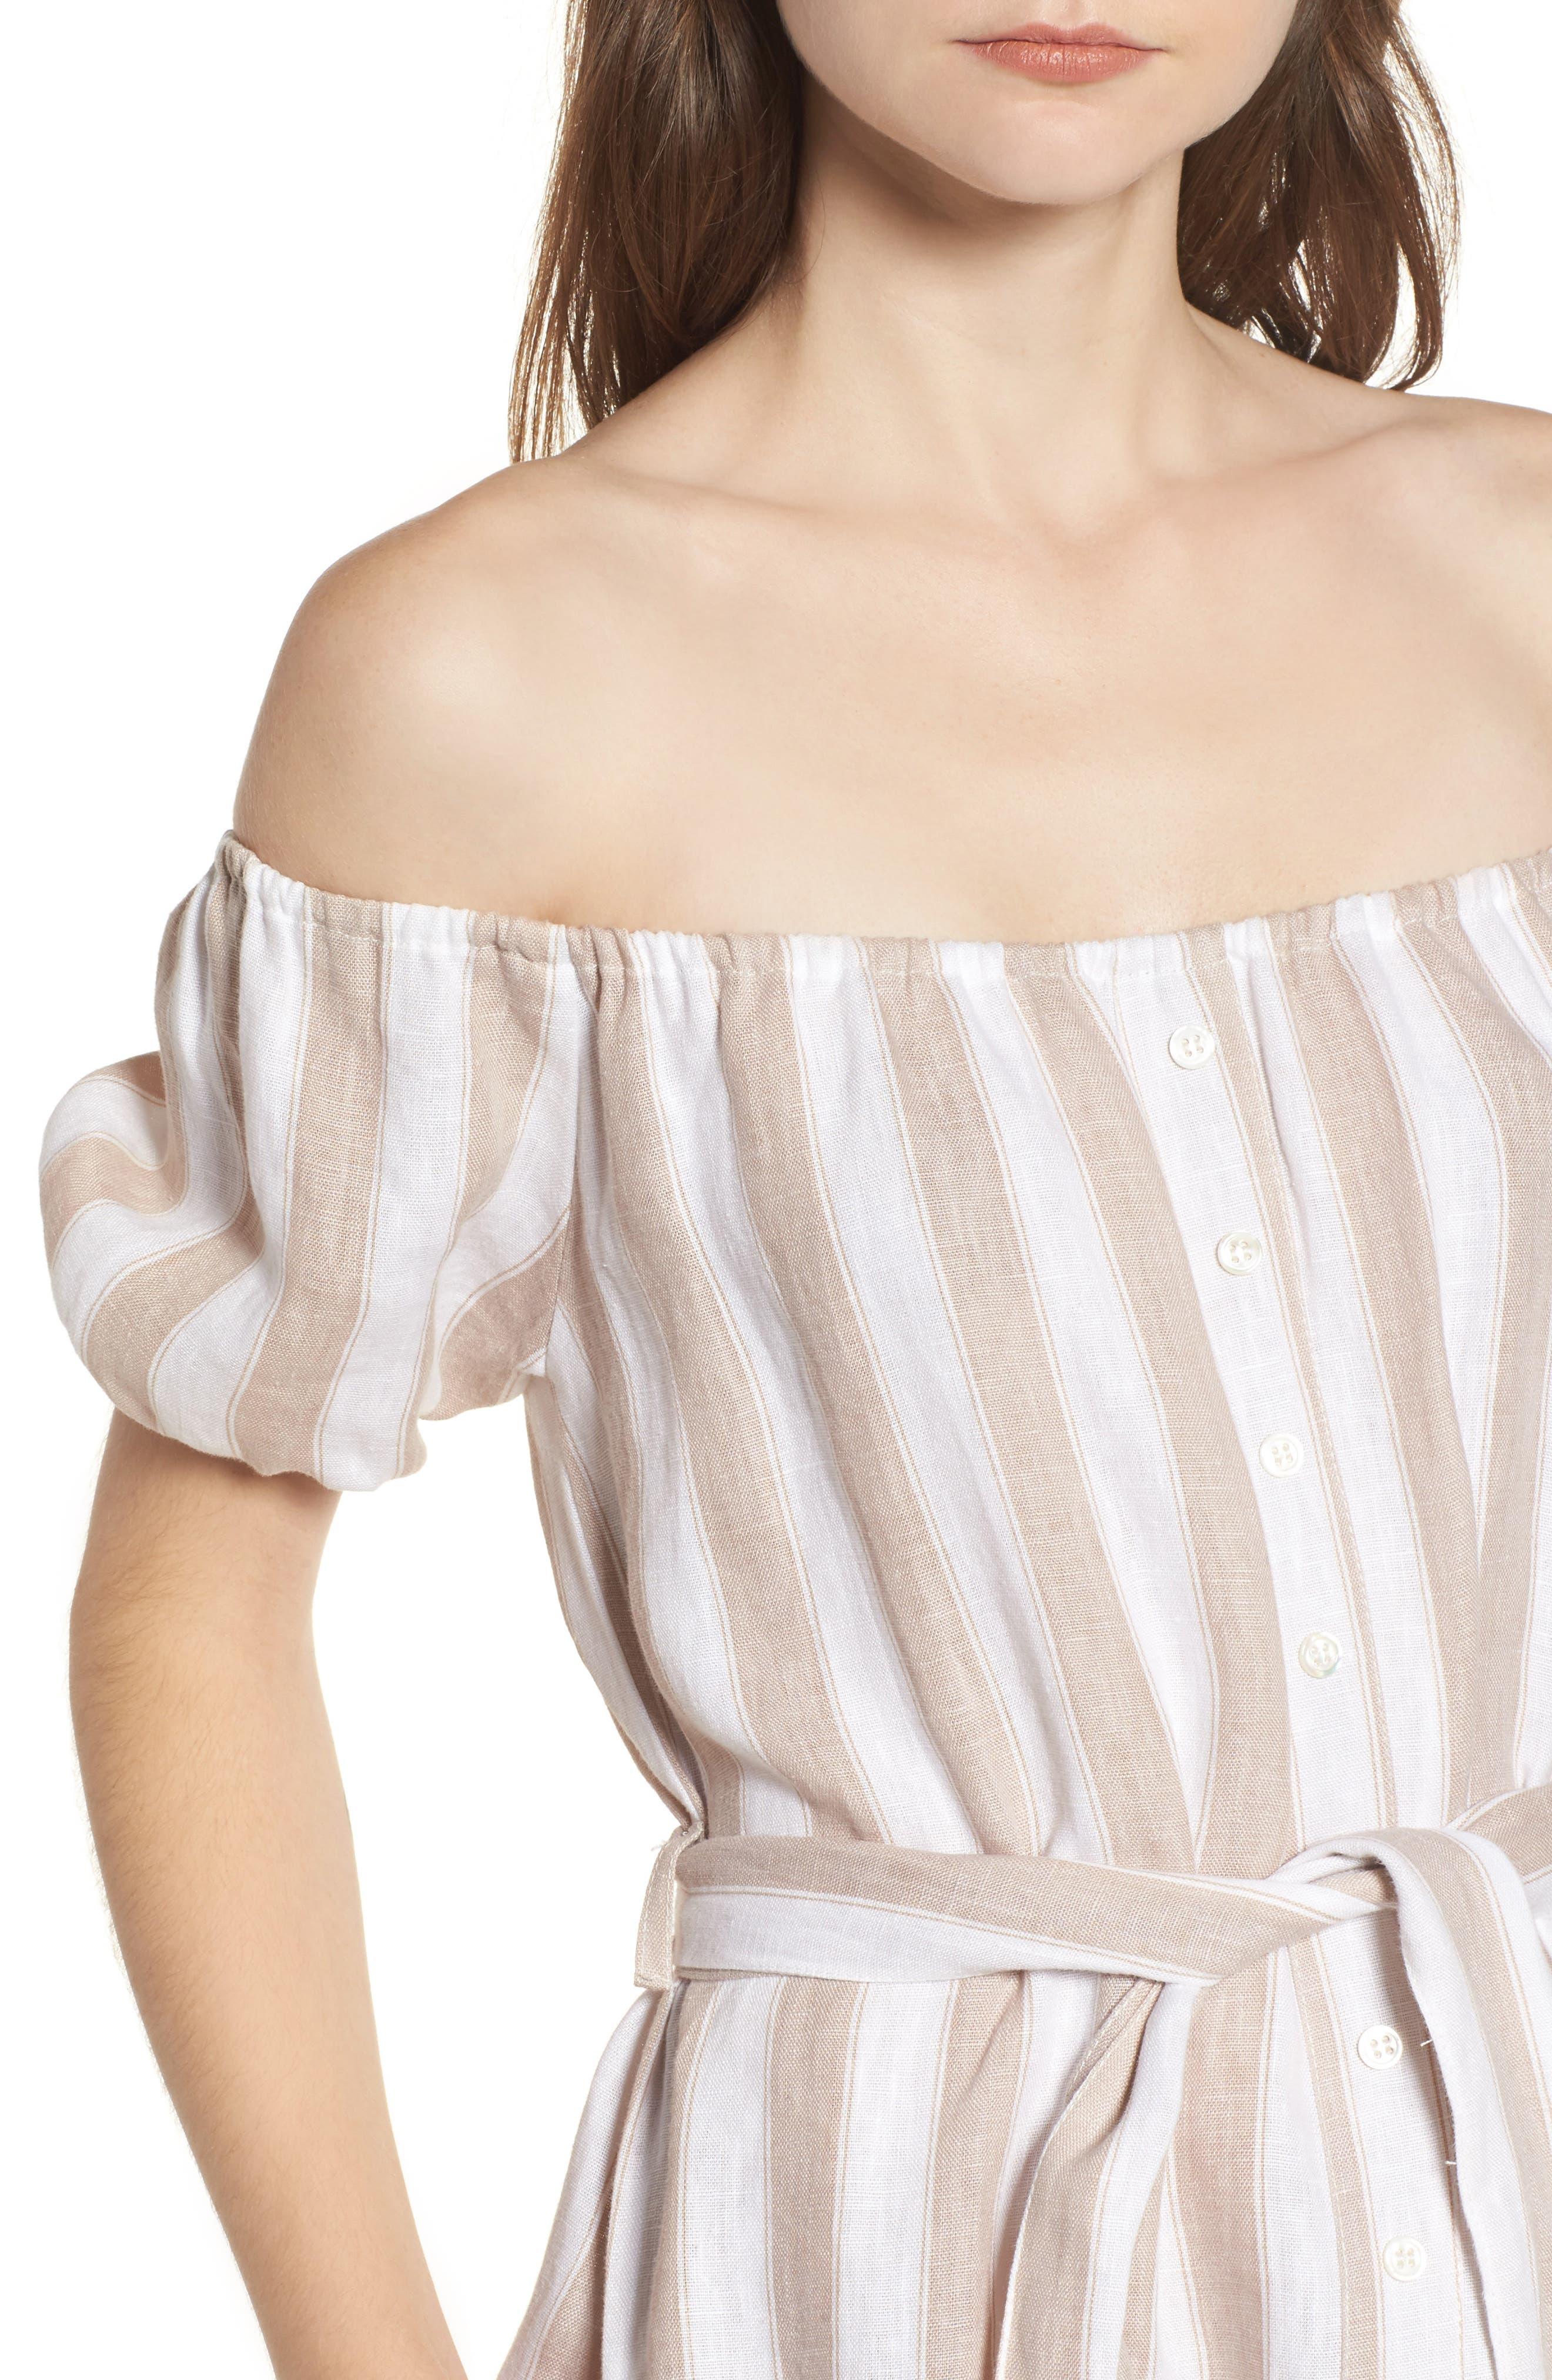 Savoy Off the Shoulder Dress,                             Alternate thumbnail 4, color,                             100